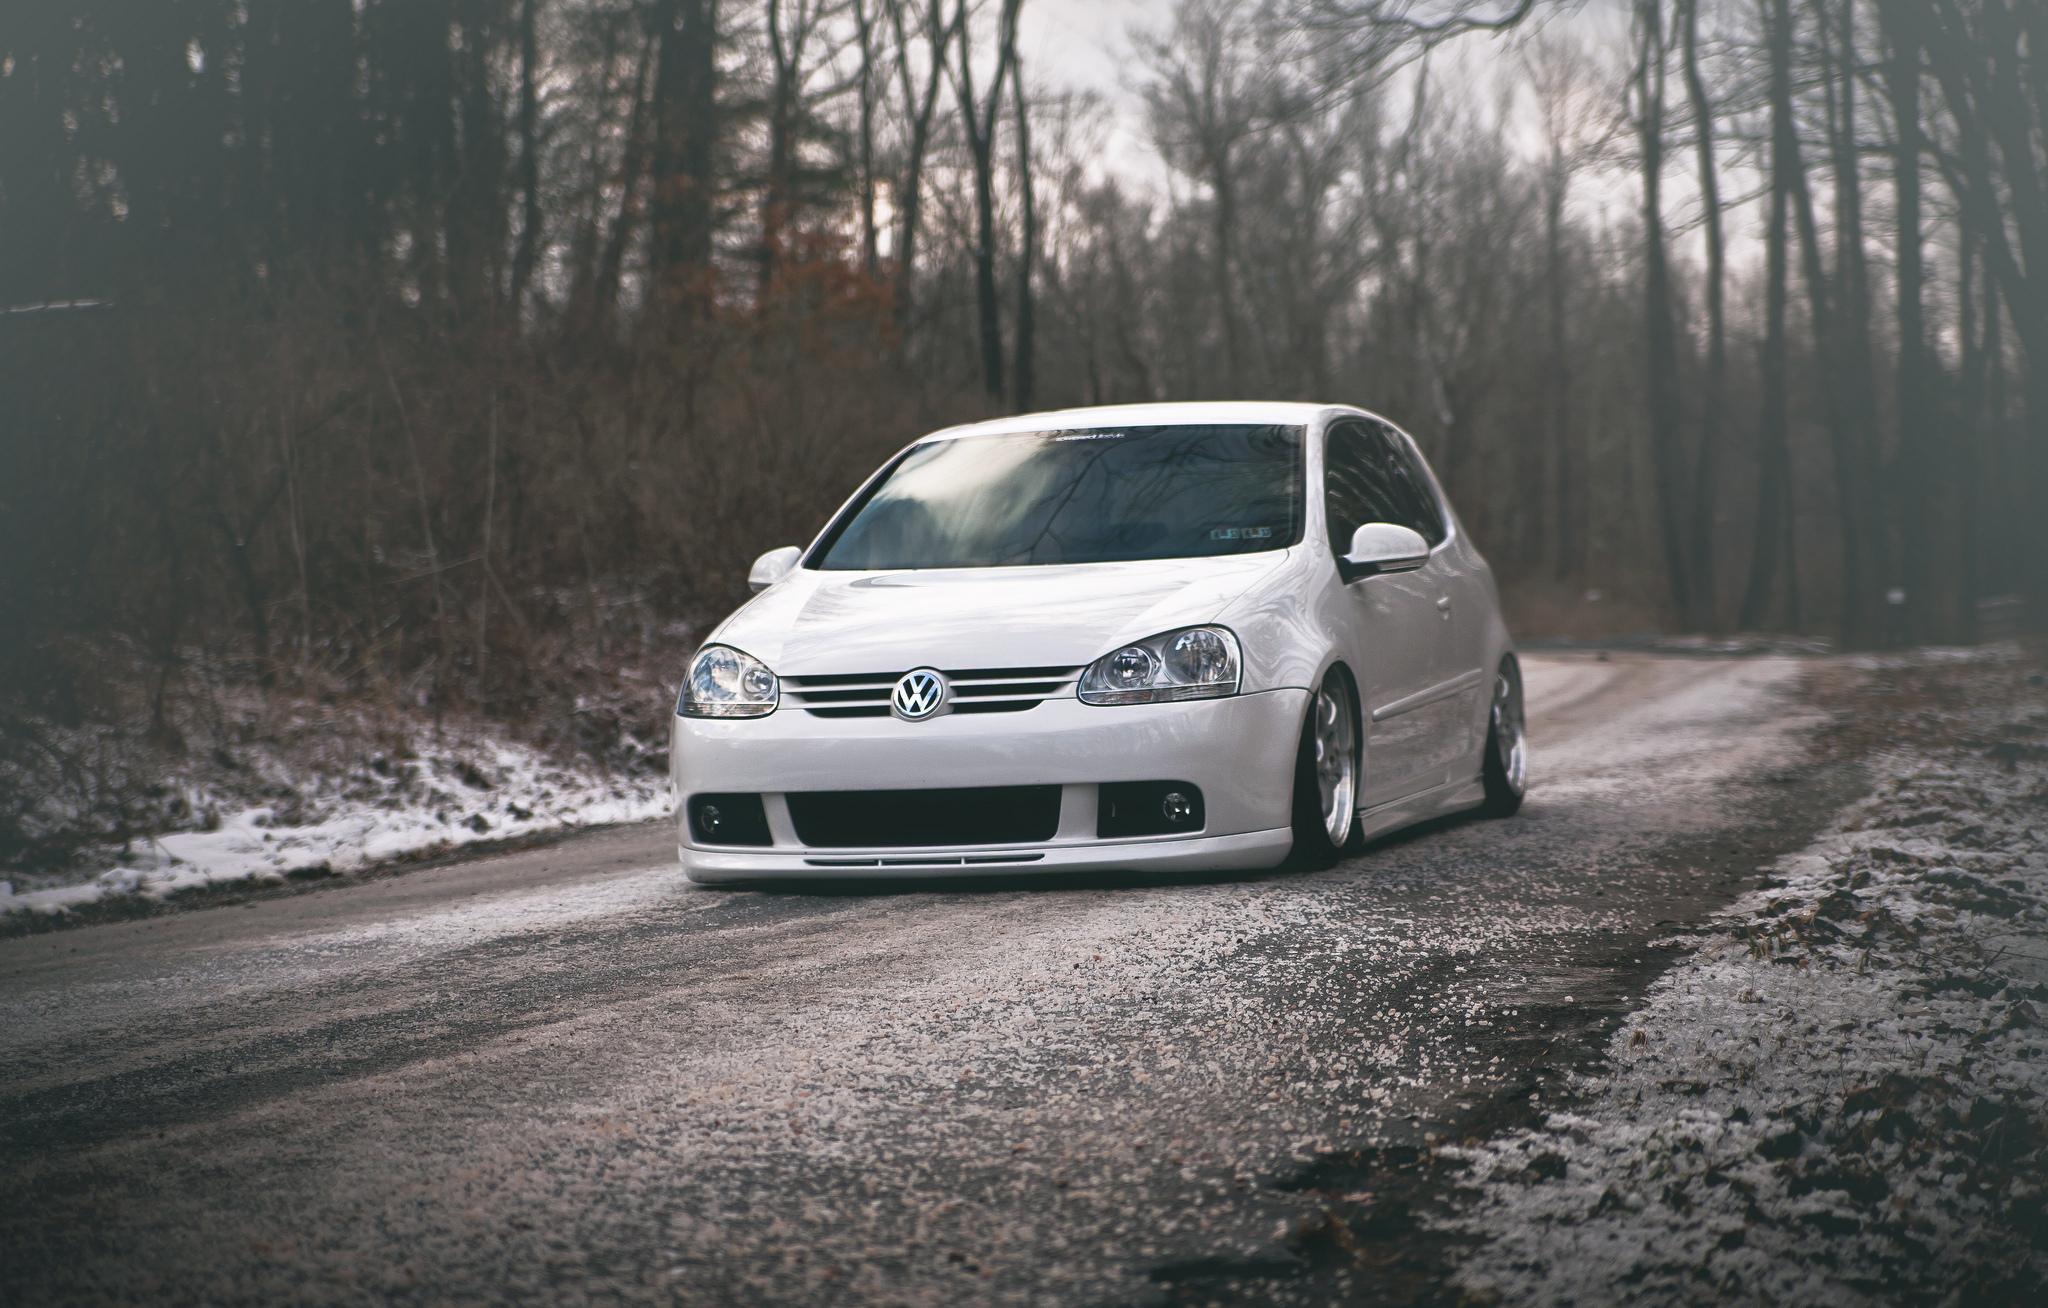 Wallpaper Volkswagen Golf Gti Tuning White 2048x1308